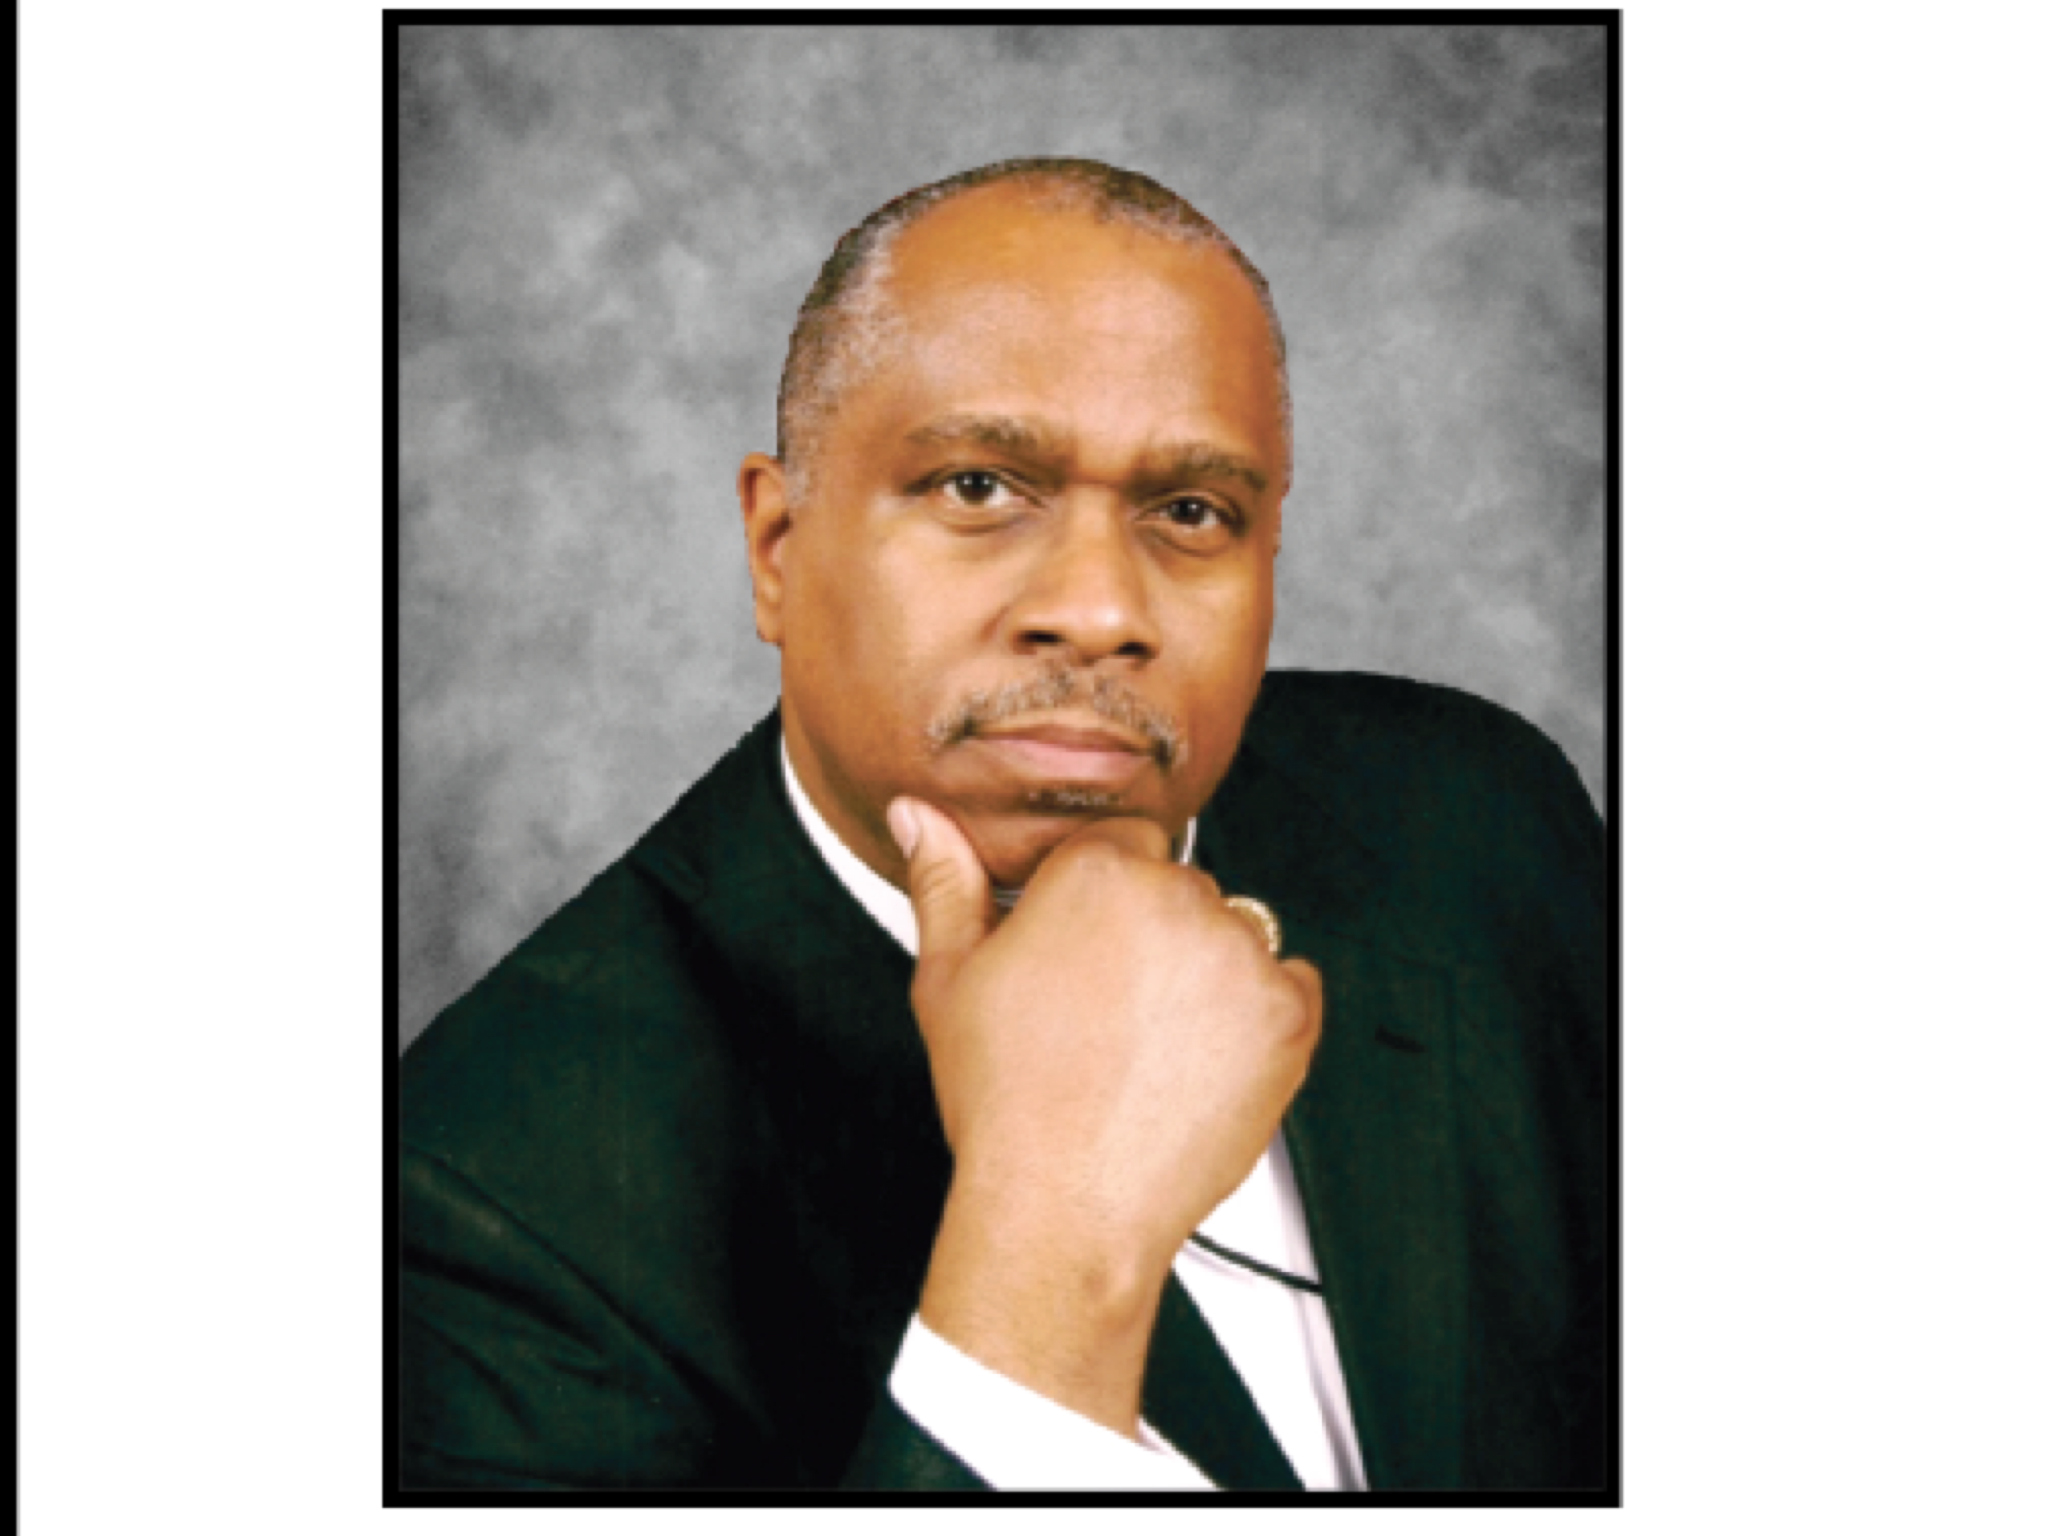 Superintendent Tony H. Campbell